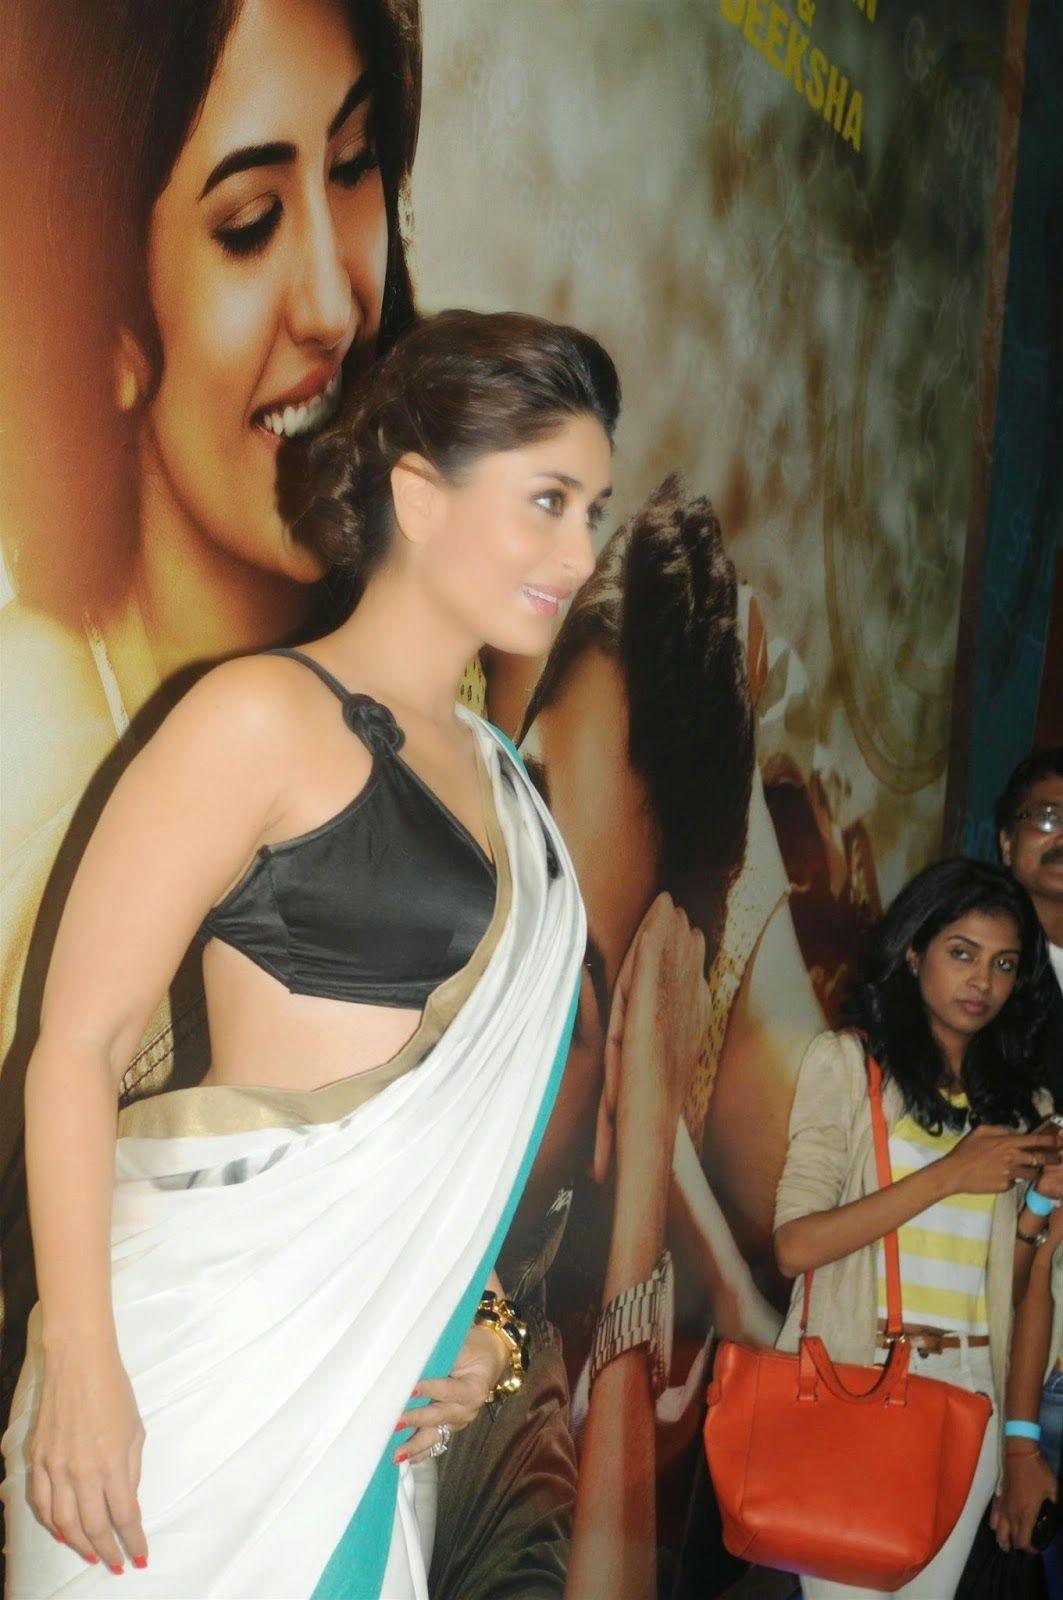 Armpit Actress Photo Kareena Kapoor Hot Photo Shootkareena Kapoor Hot